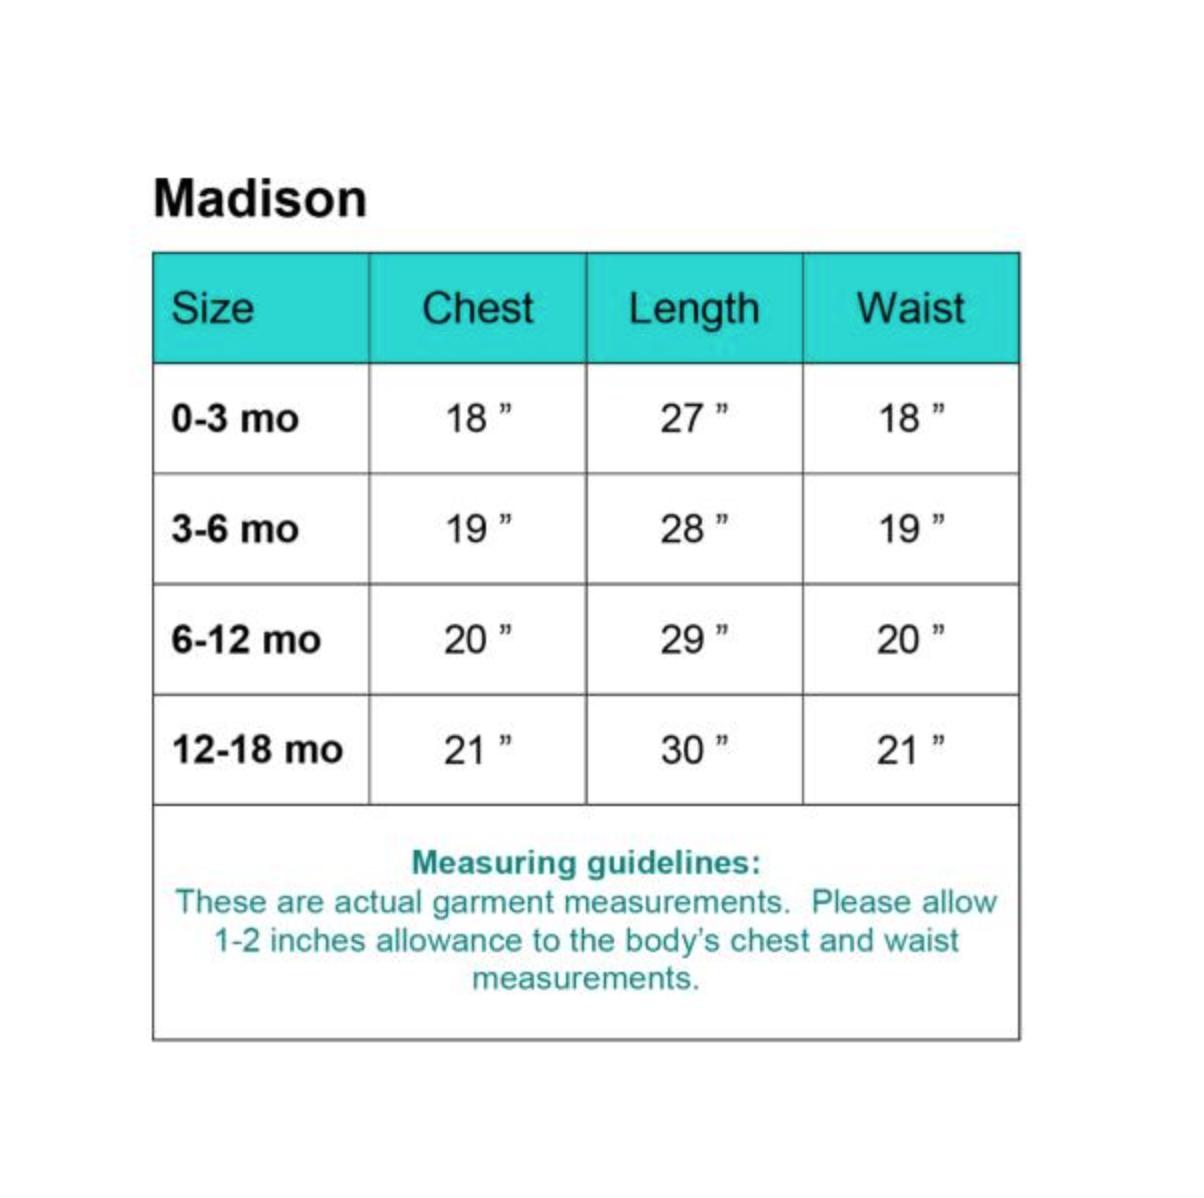 sizing-chart-madison.png